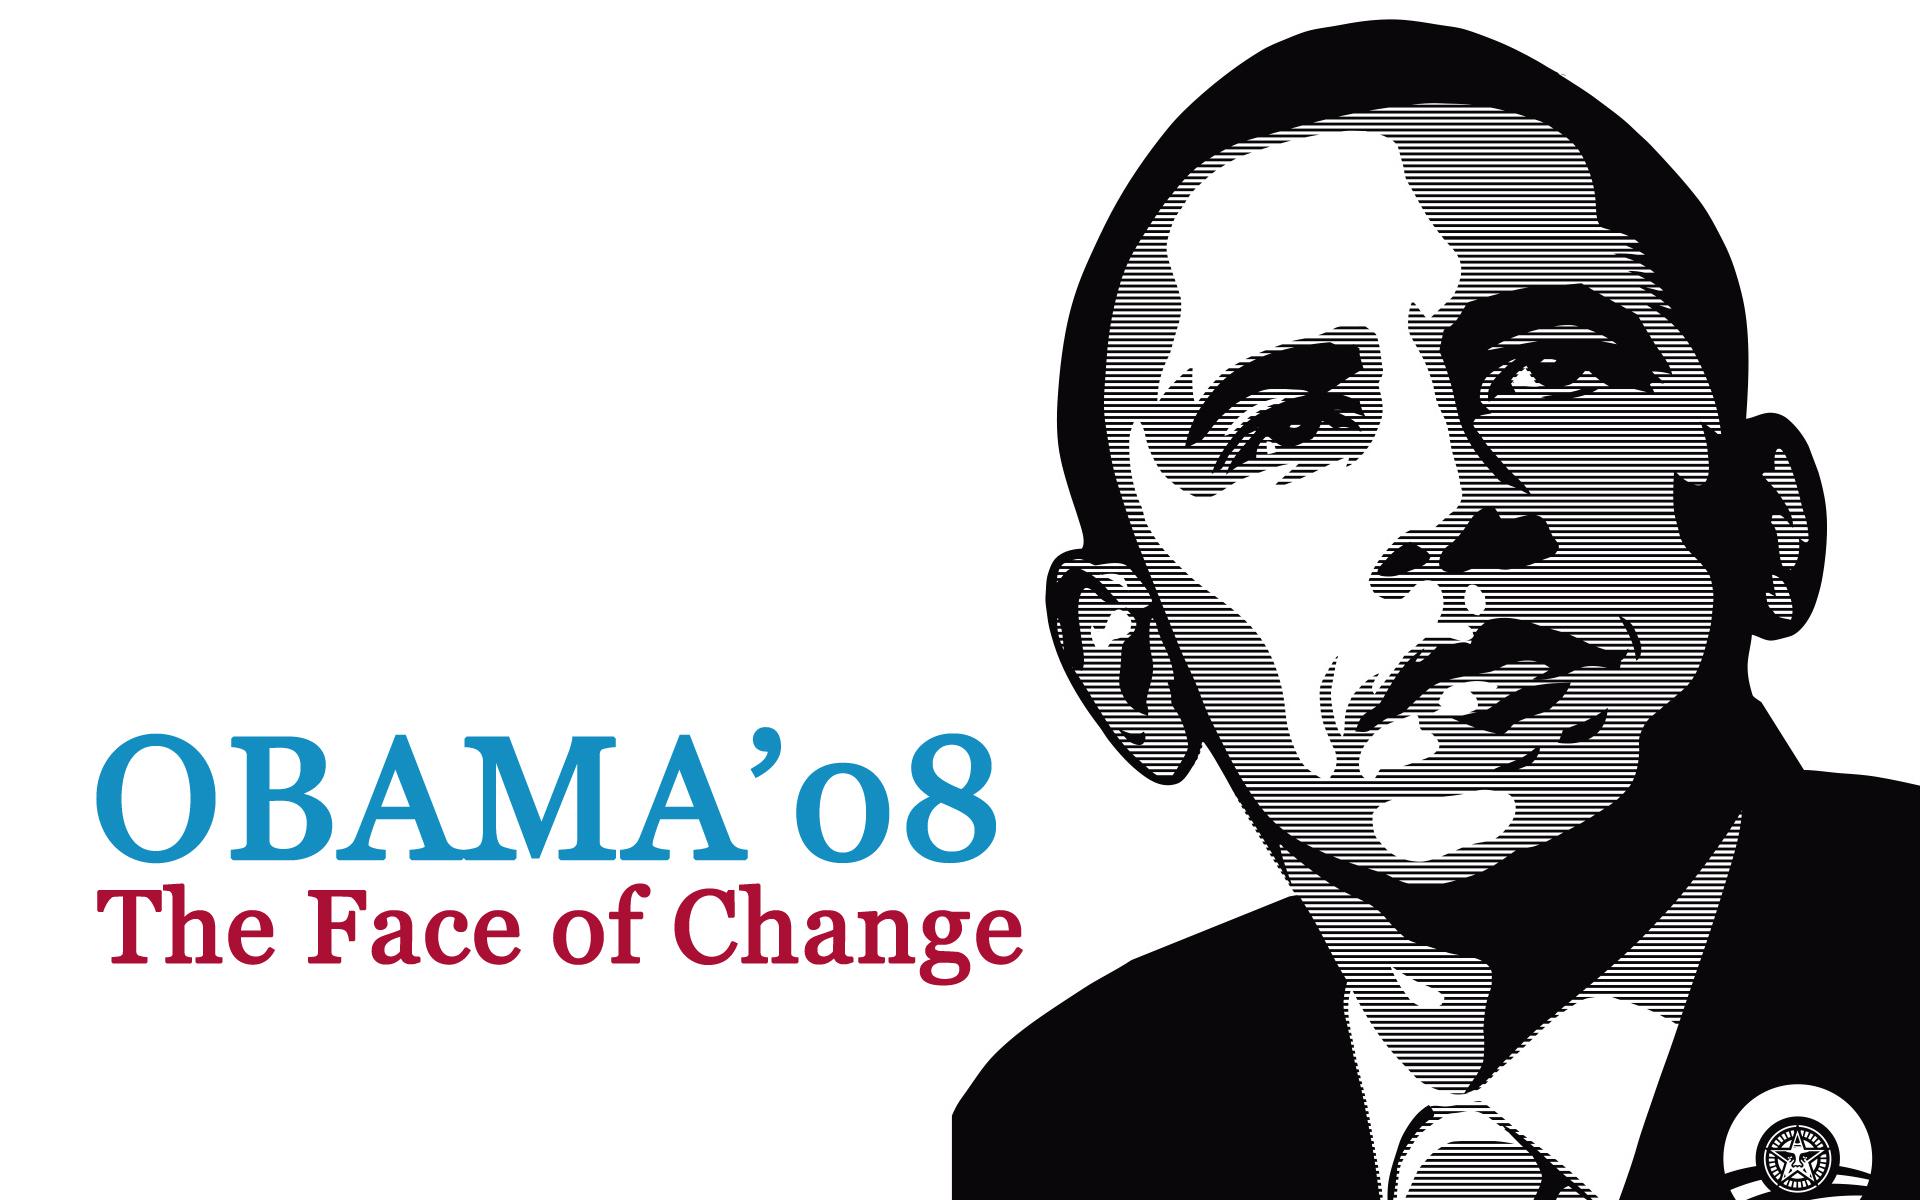 Barack Obama Wallpaper Image Pics 2014 1920x1200